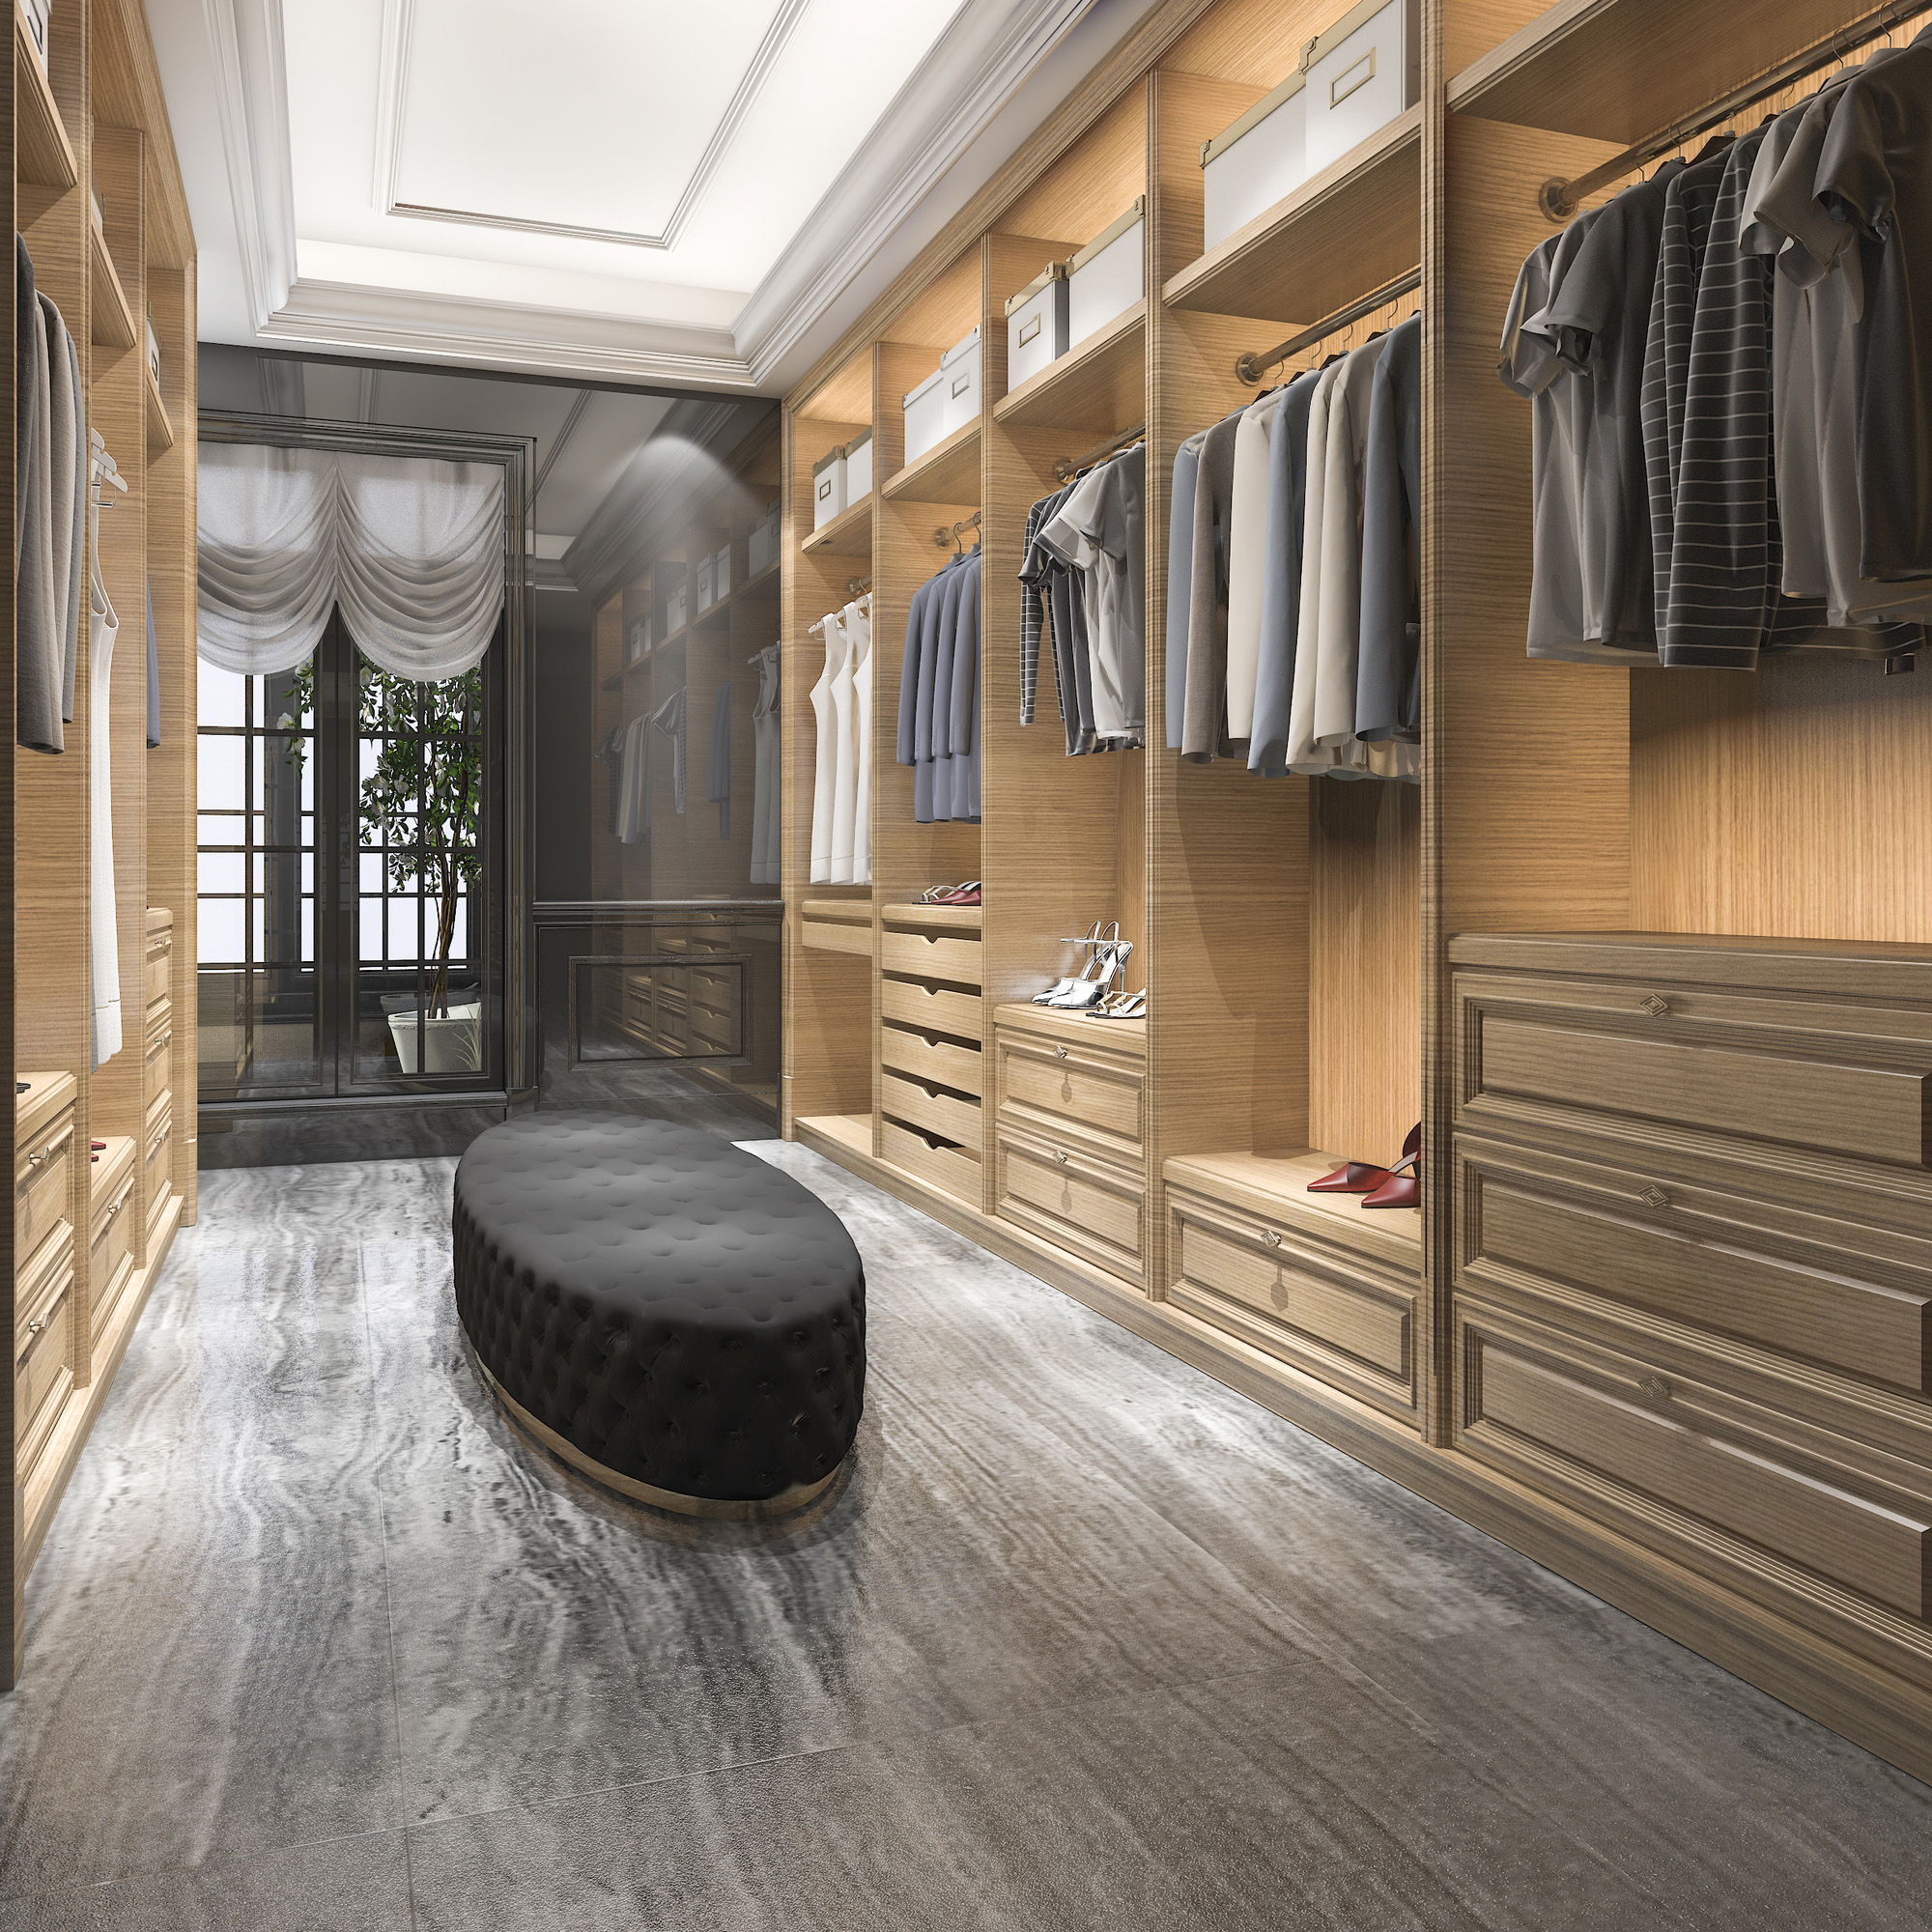 walk in wardrobe, bedroom furniture ideas, walk in closet